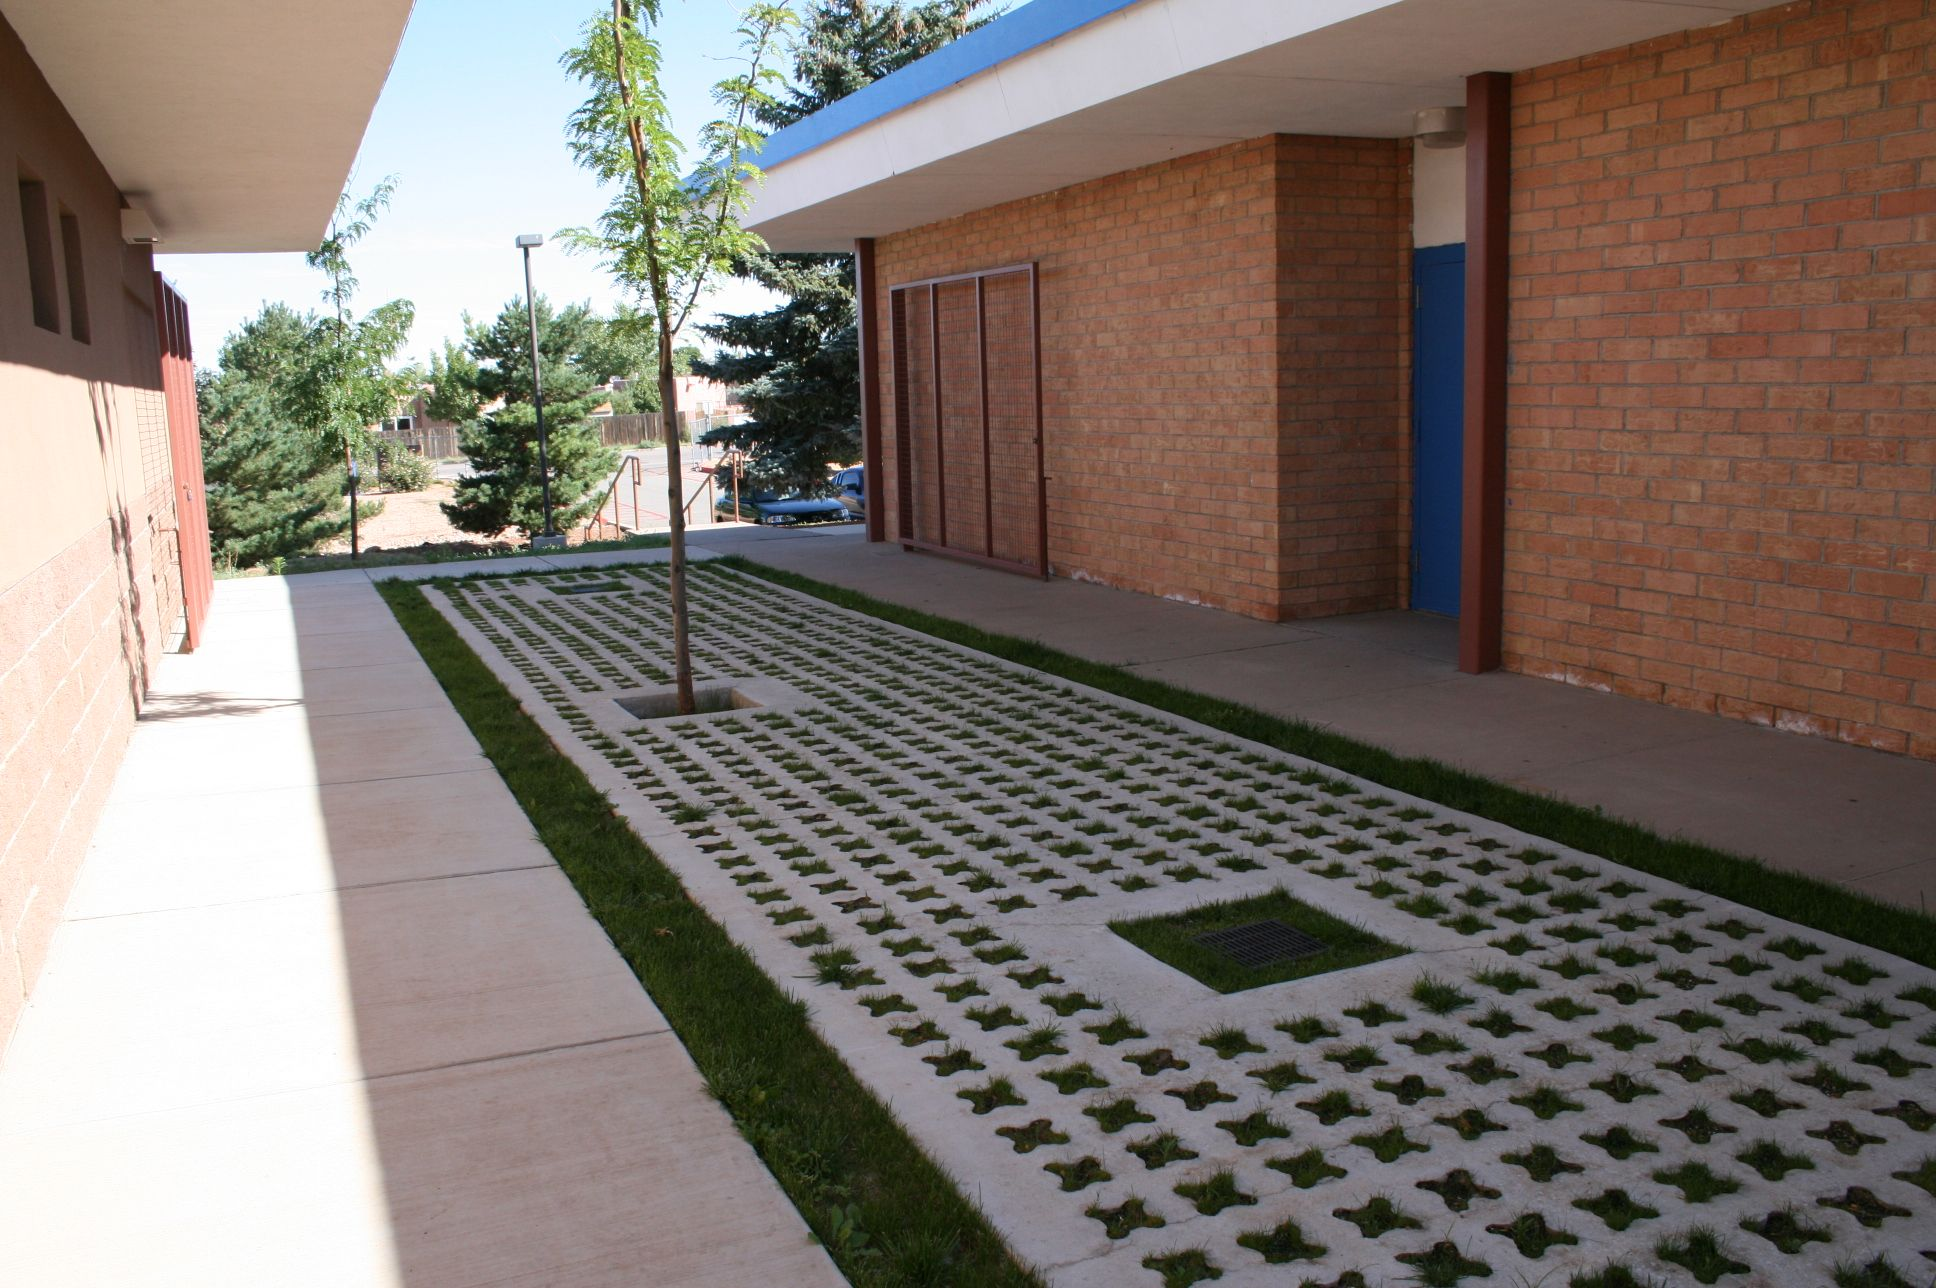 Grasscrete - St. Mikes School - 03